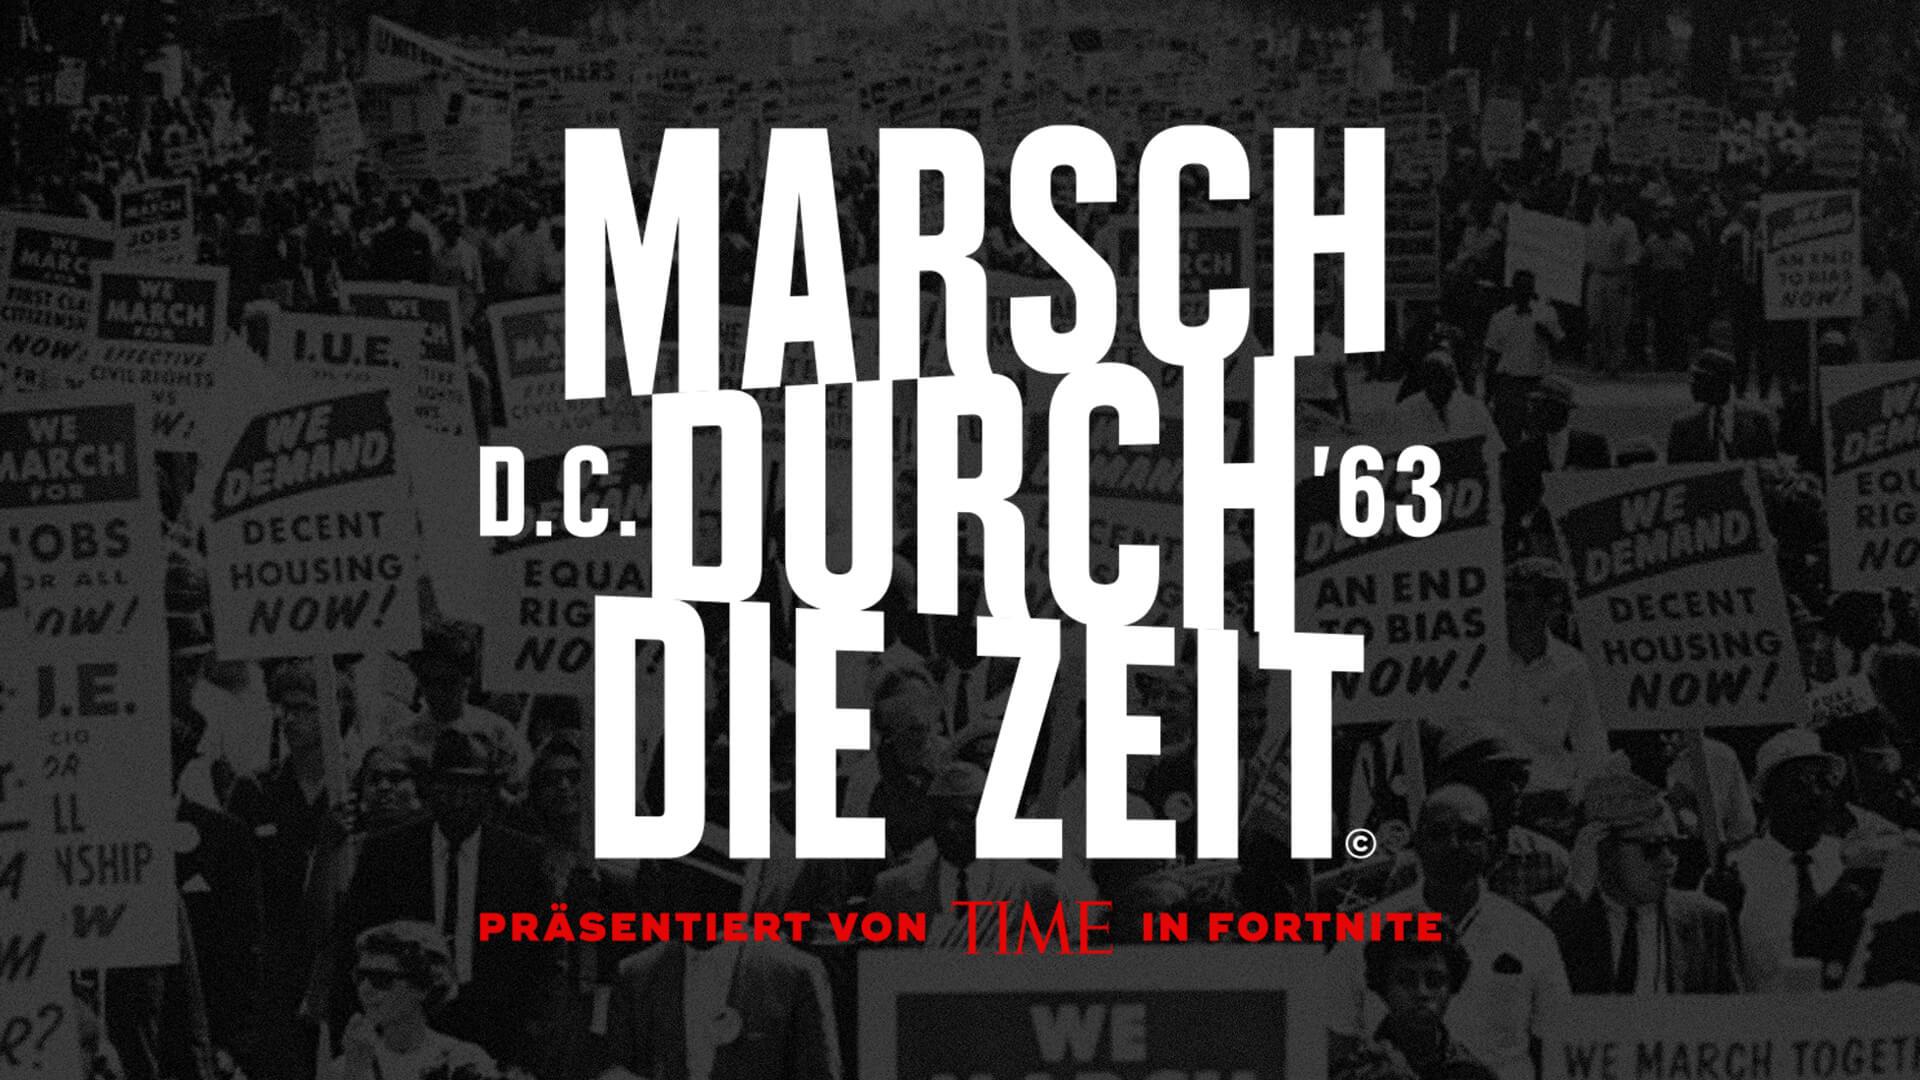 DE 17CM Social TheMarch Protest Social